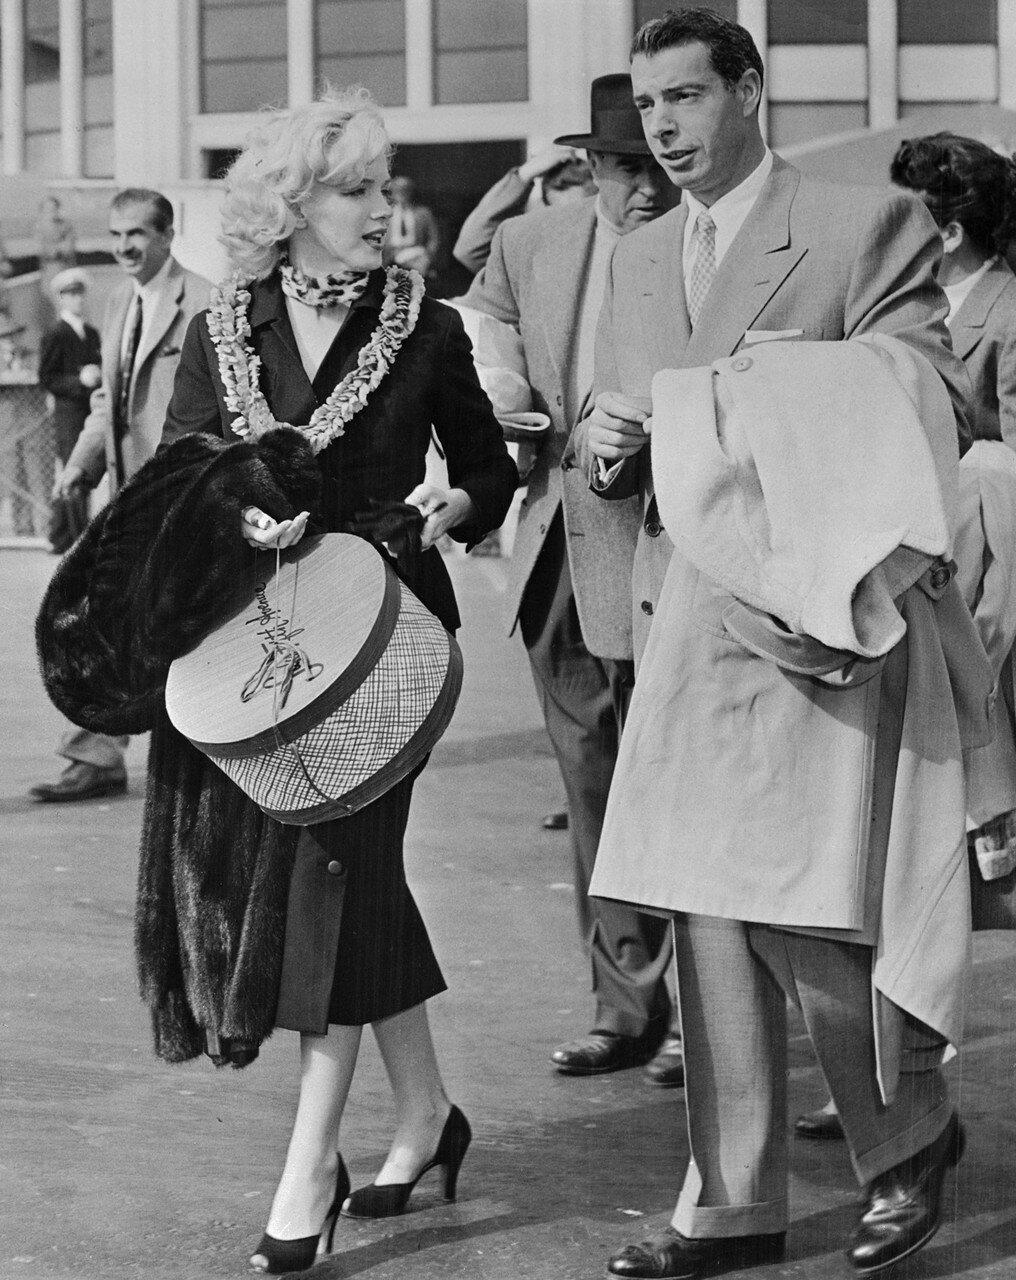 Marilyn with Joe Dimaggio